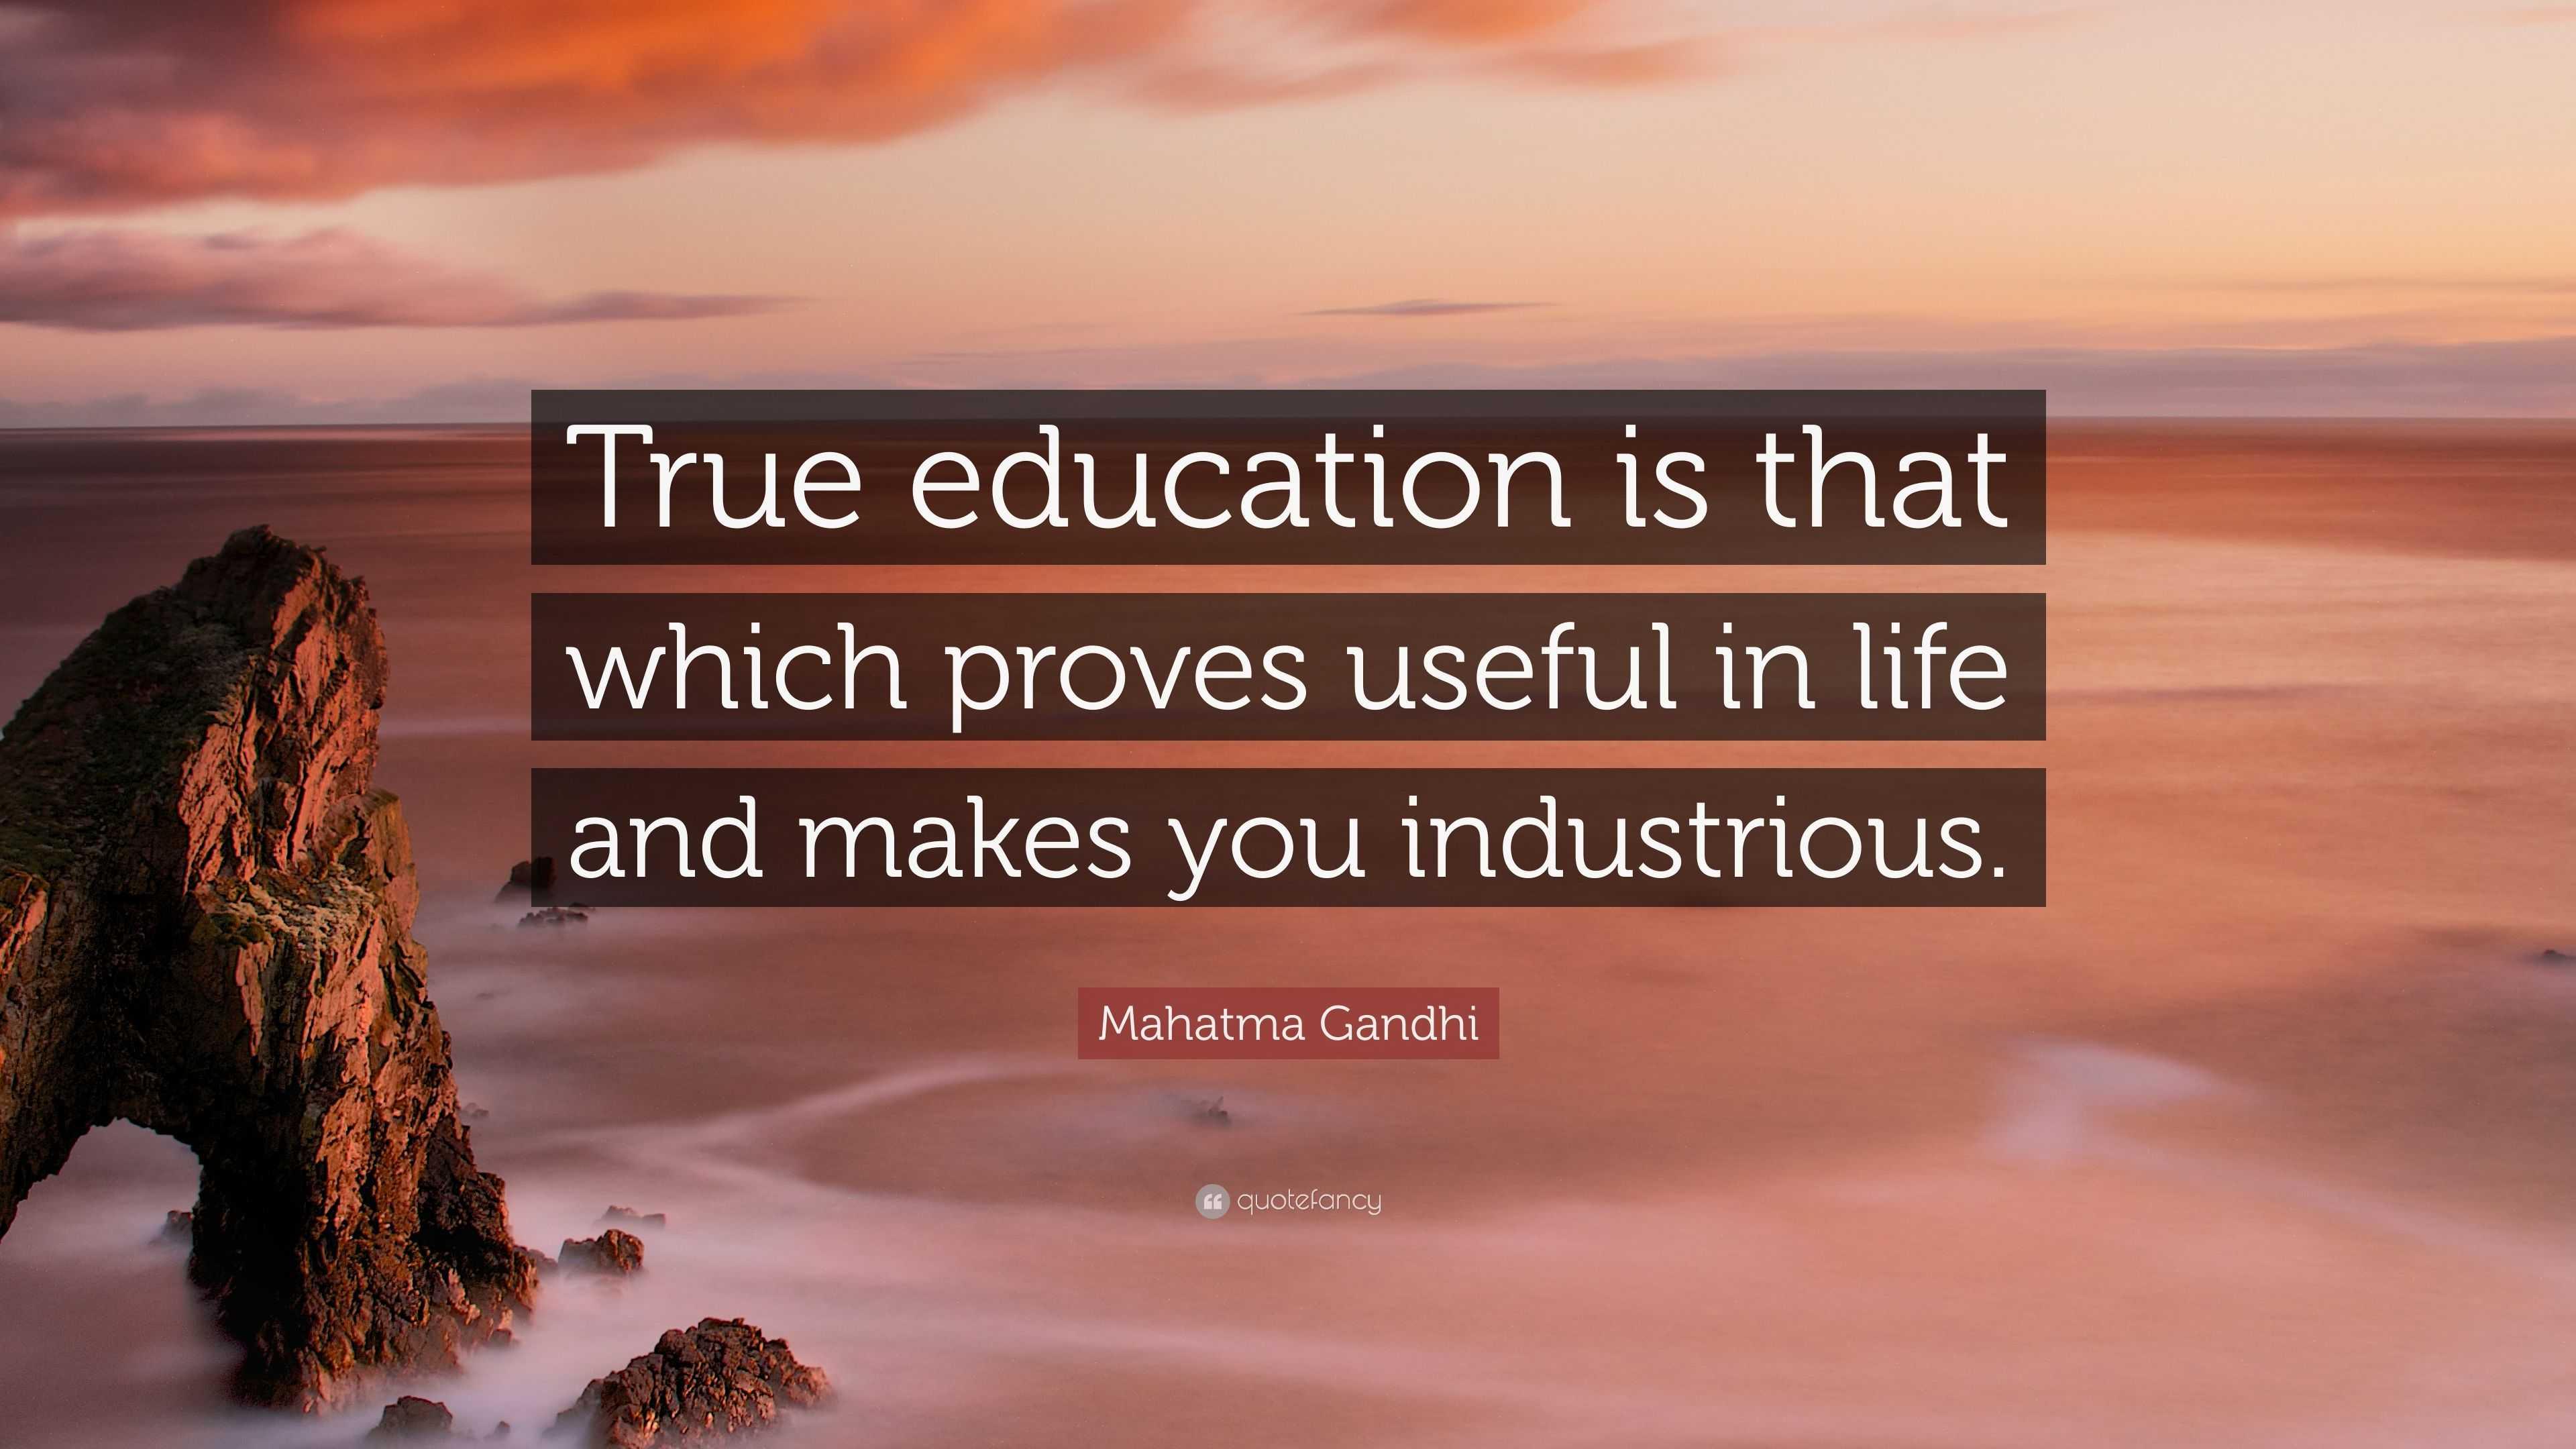 A True Education